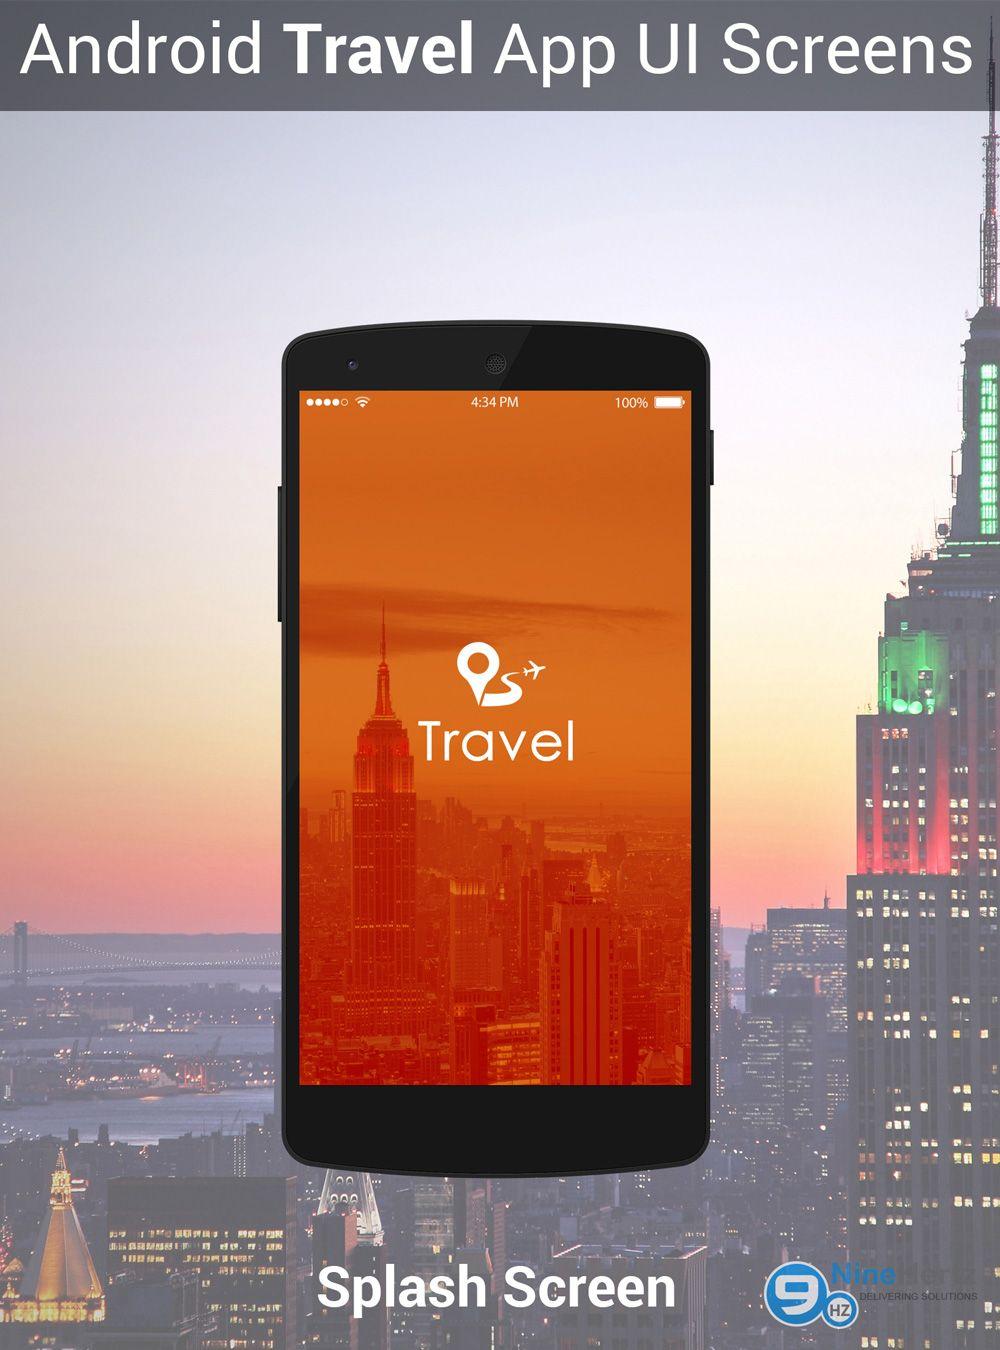 Android Travel App UI Screens PSD | Free Mobile App UI PSD ...